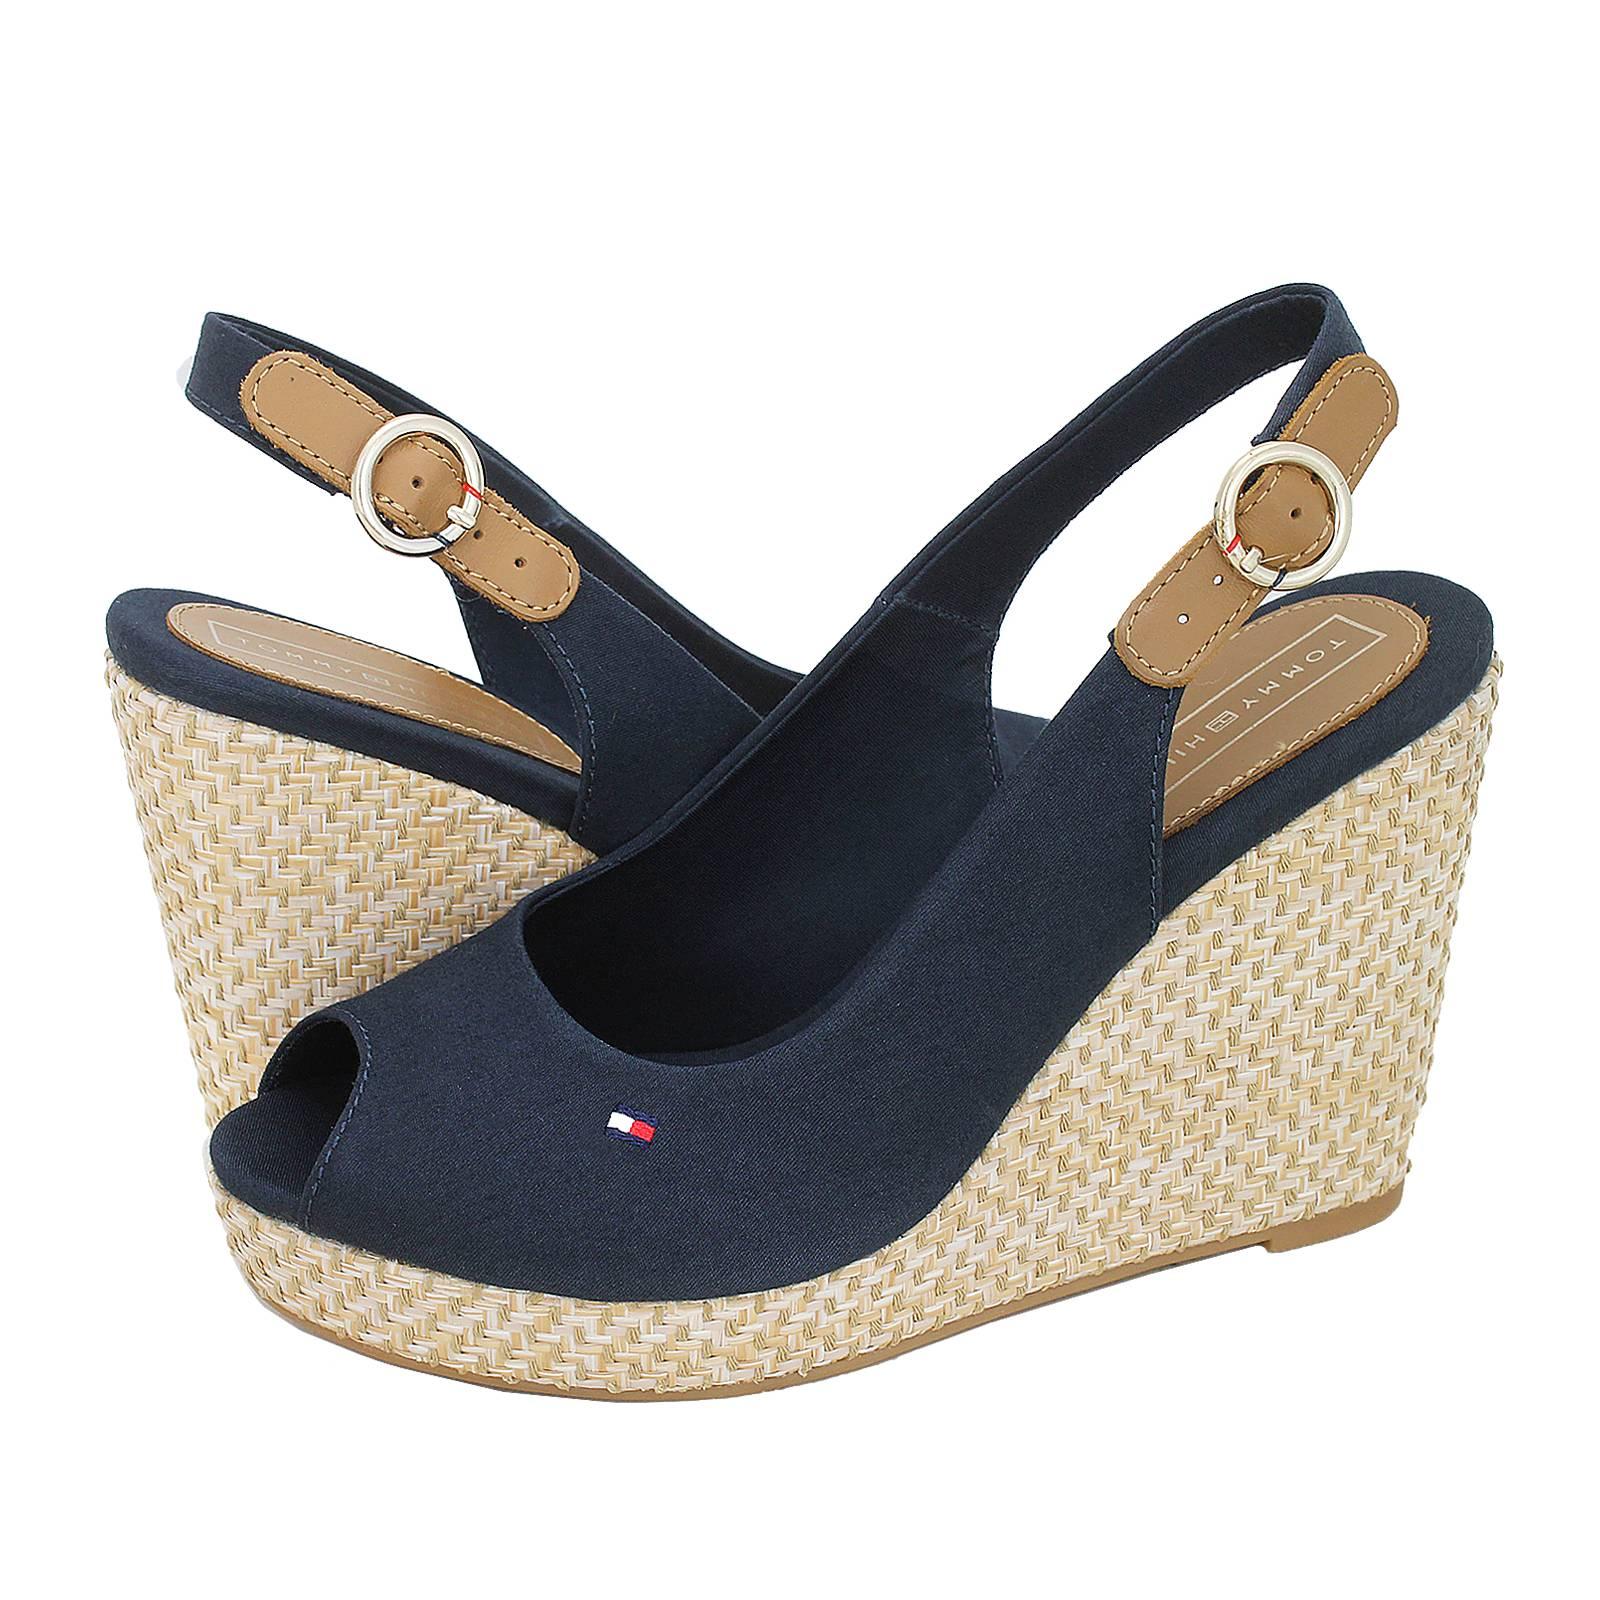 843f0922c16 Iconic Elena Basic Sling Back - Tommy Hilfiger Women s platforms ...